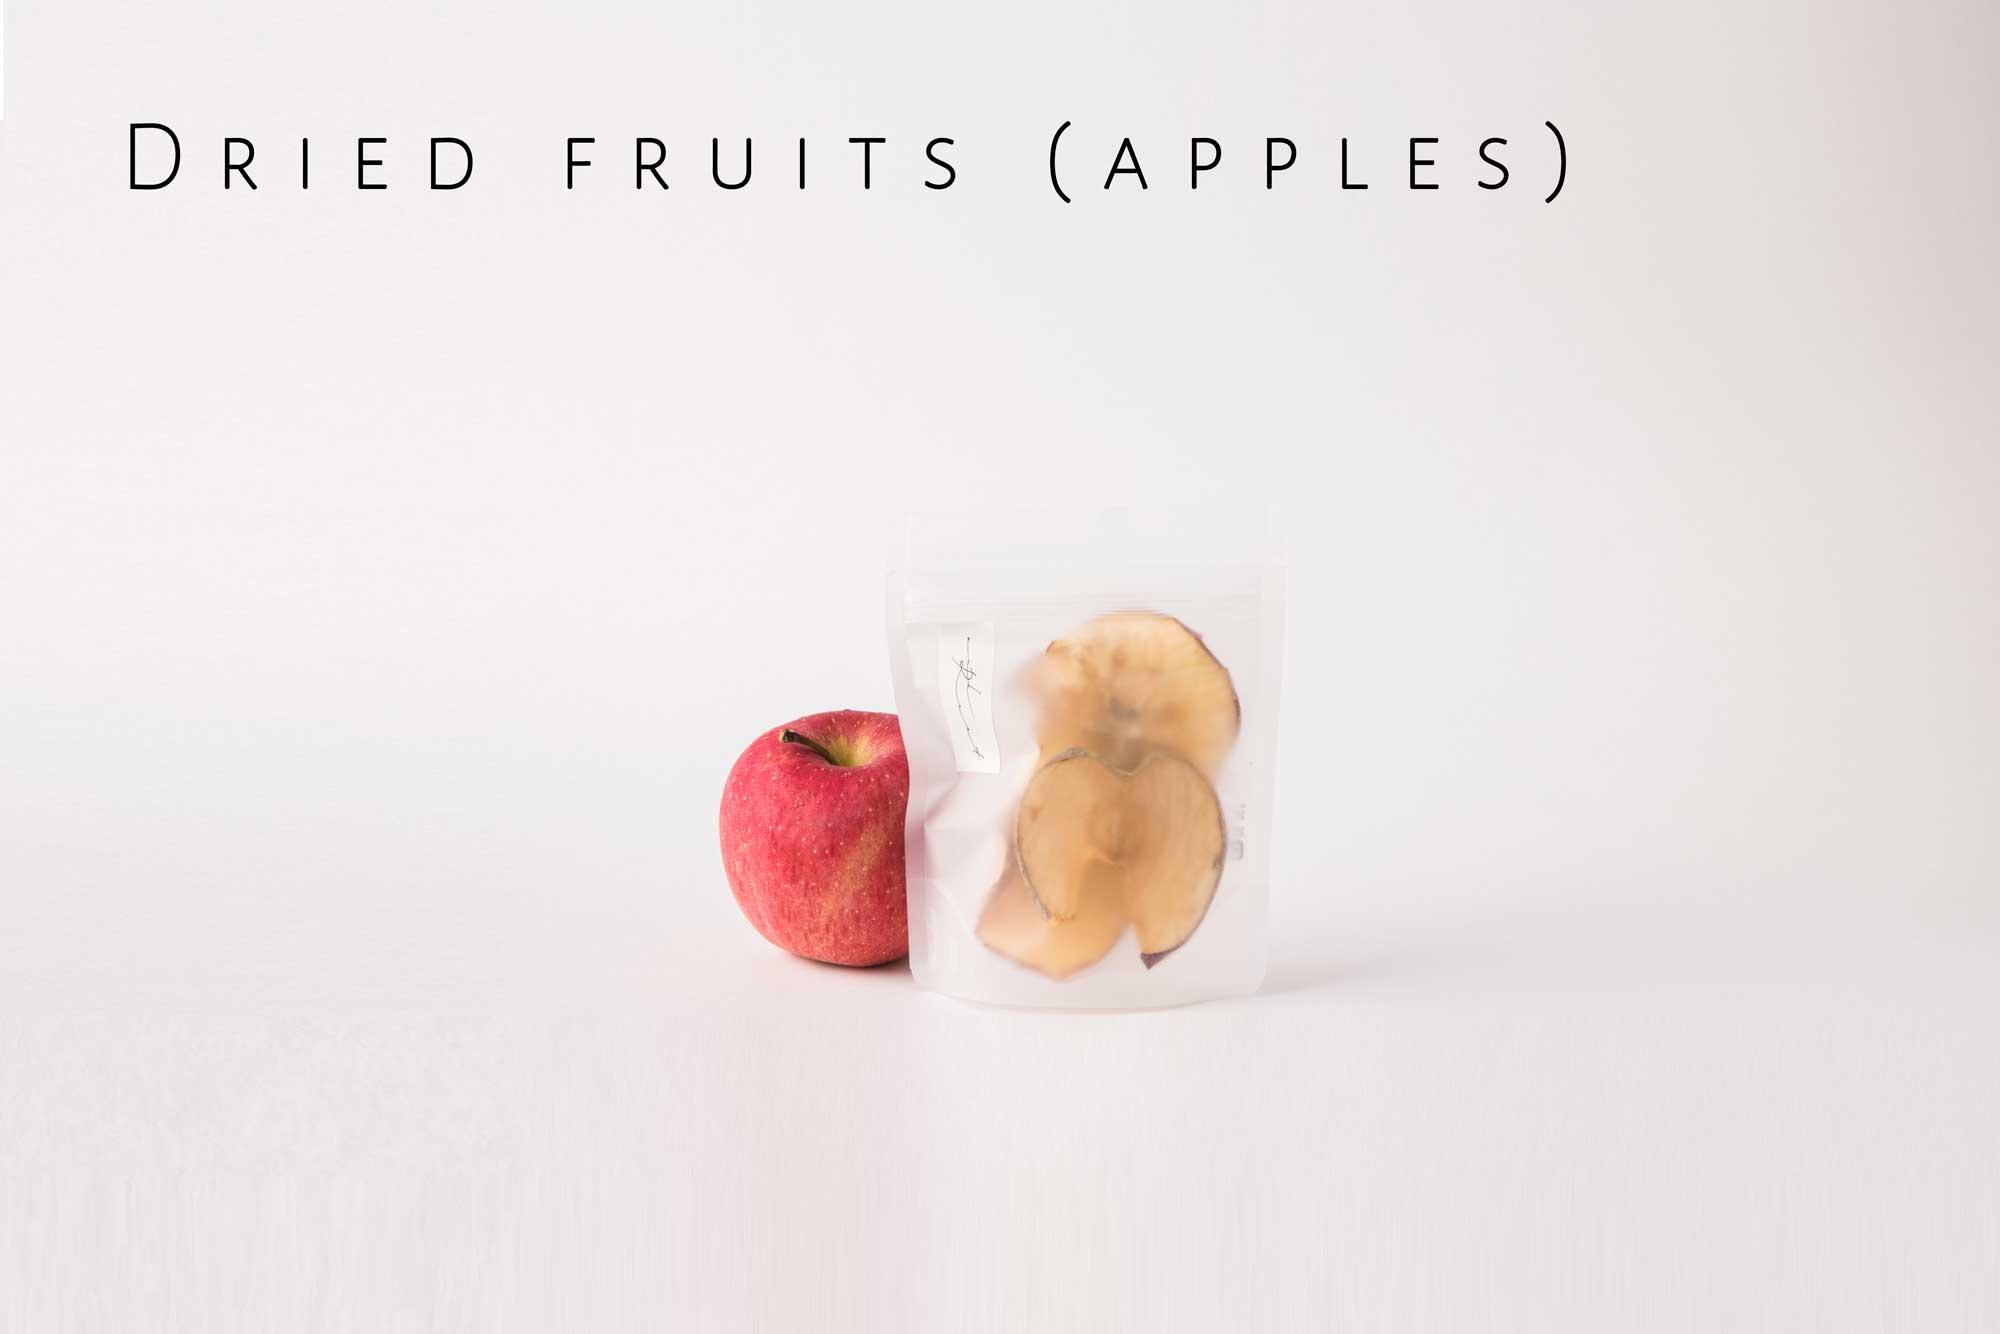 doraifruits apple